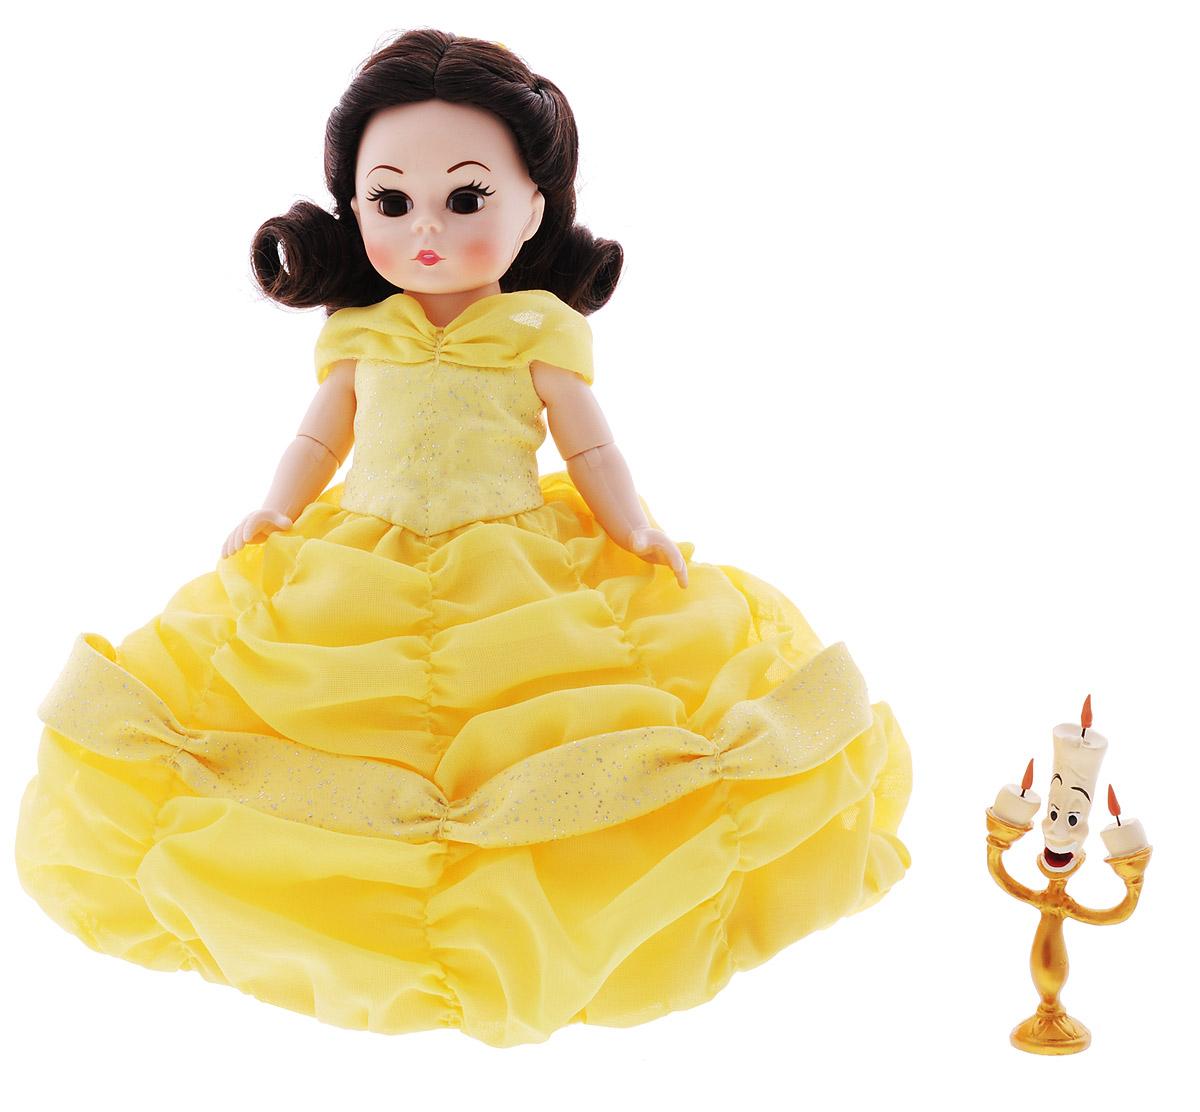 Madame Alexander Мини-кукла Белль куклы и одежда для кукол madame alexander кукла фэнси нэнси русалочка 20 см